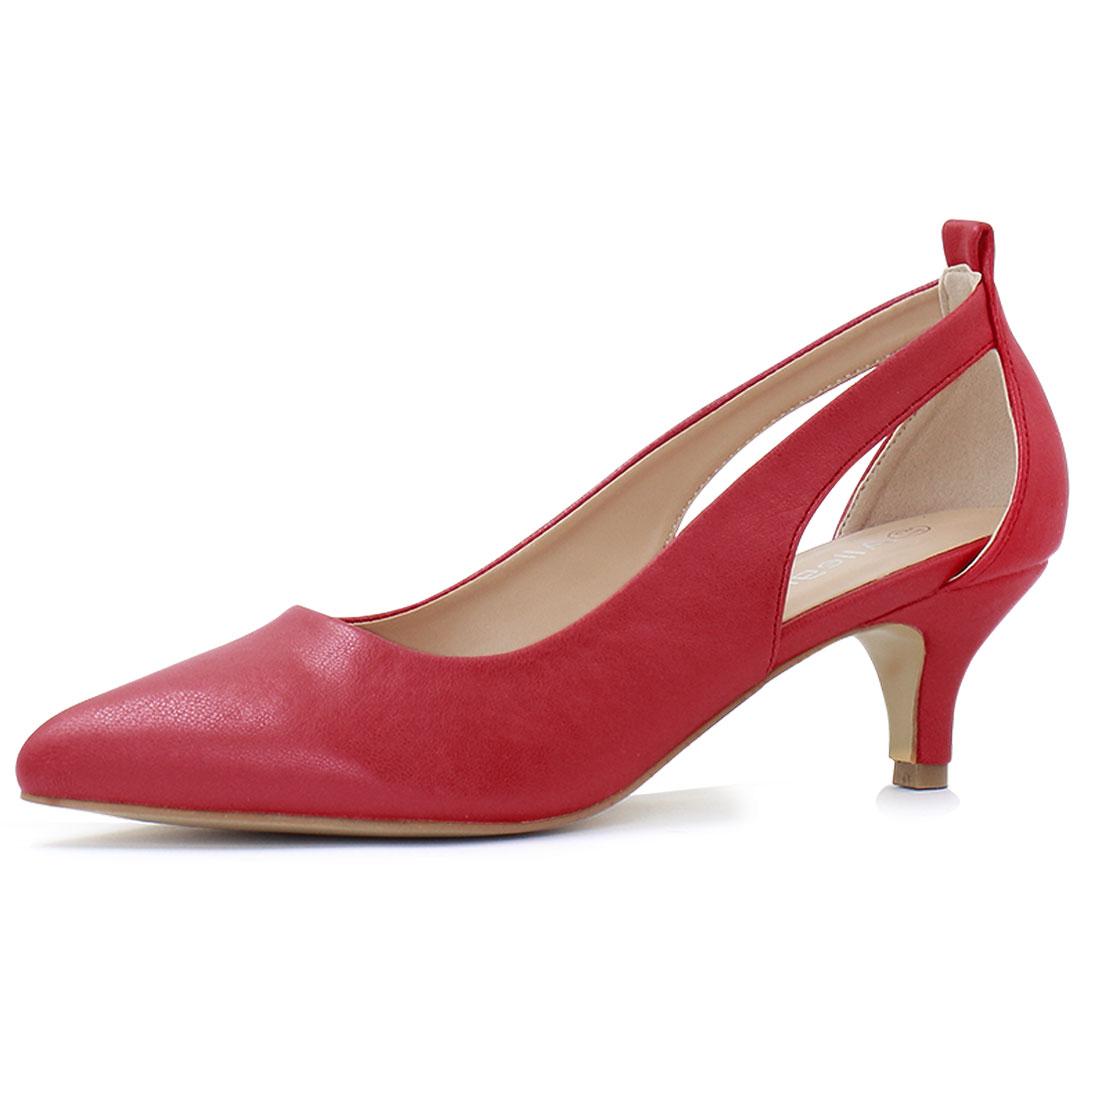 Allegra K Women's Cutout Sides Kitten Heel Pointed Toe Pumps Red US 10.5